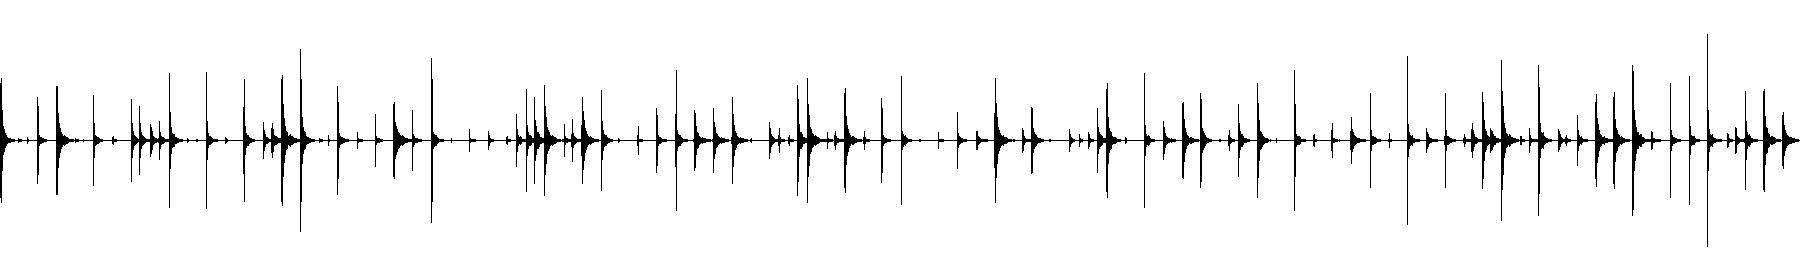 06 bongos c